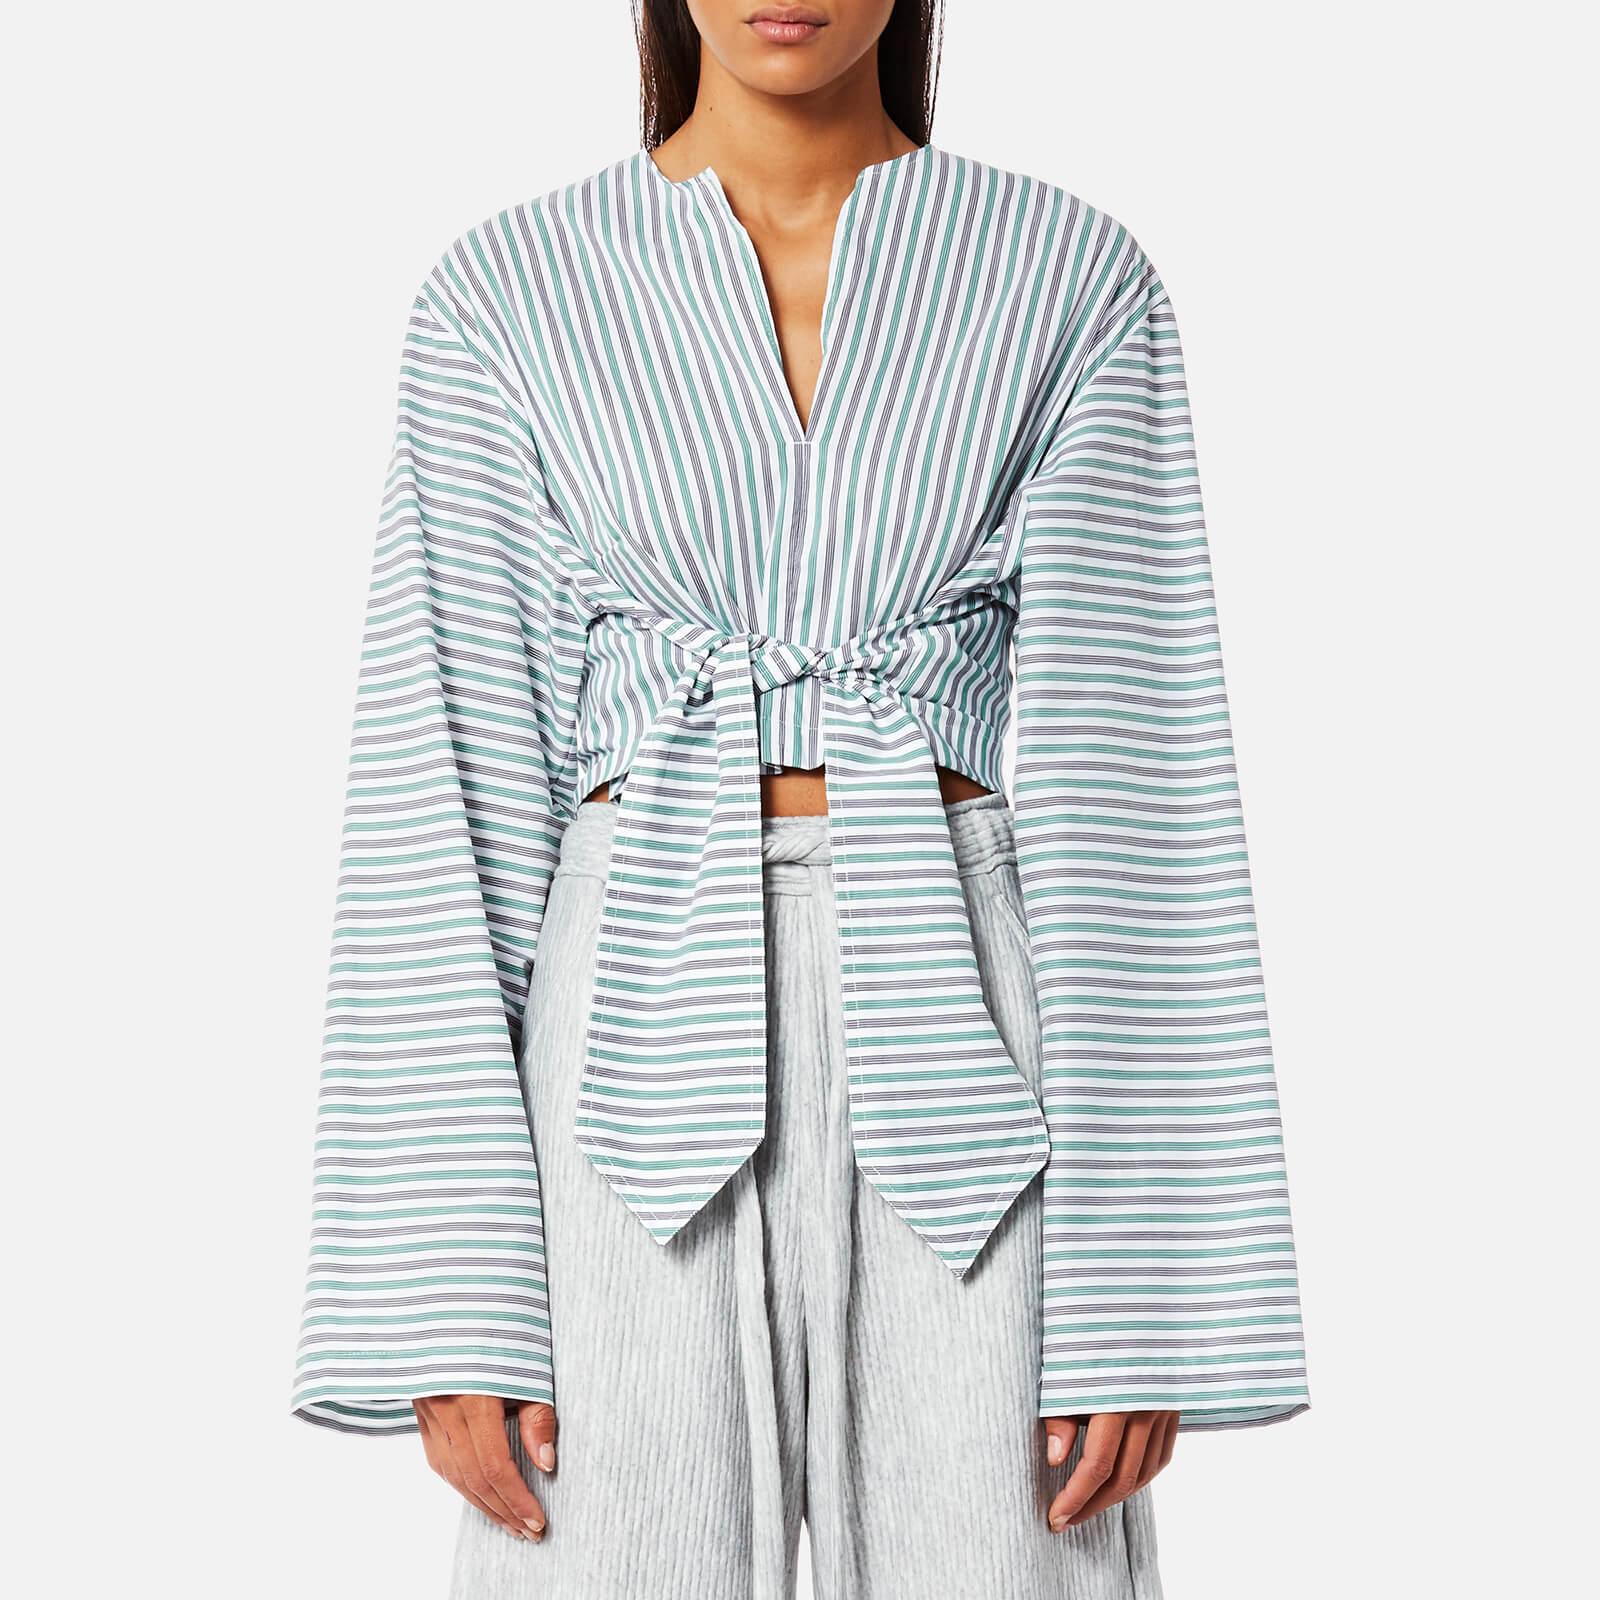 House of Sunny Women's Wrangler Shirt with Tie Front - Stripe - UK 8 - Multi